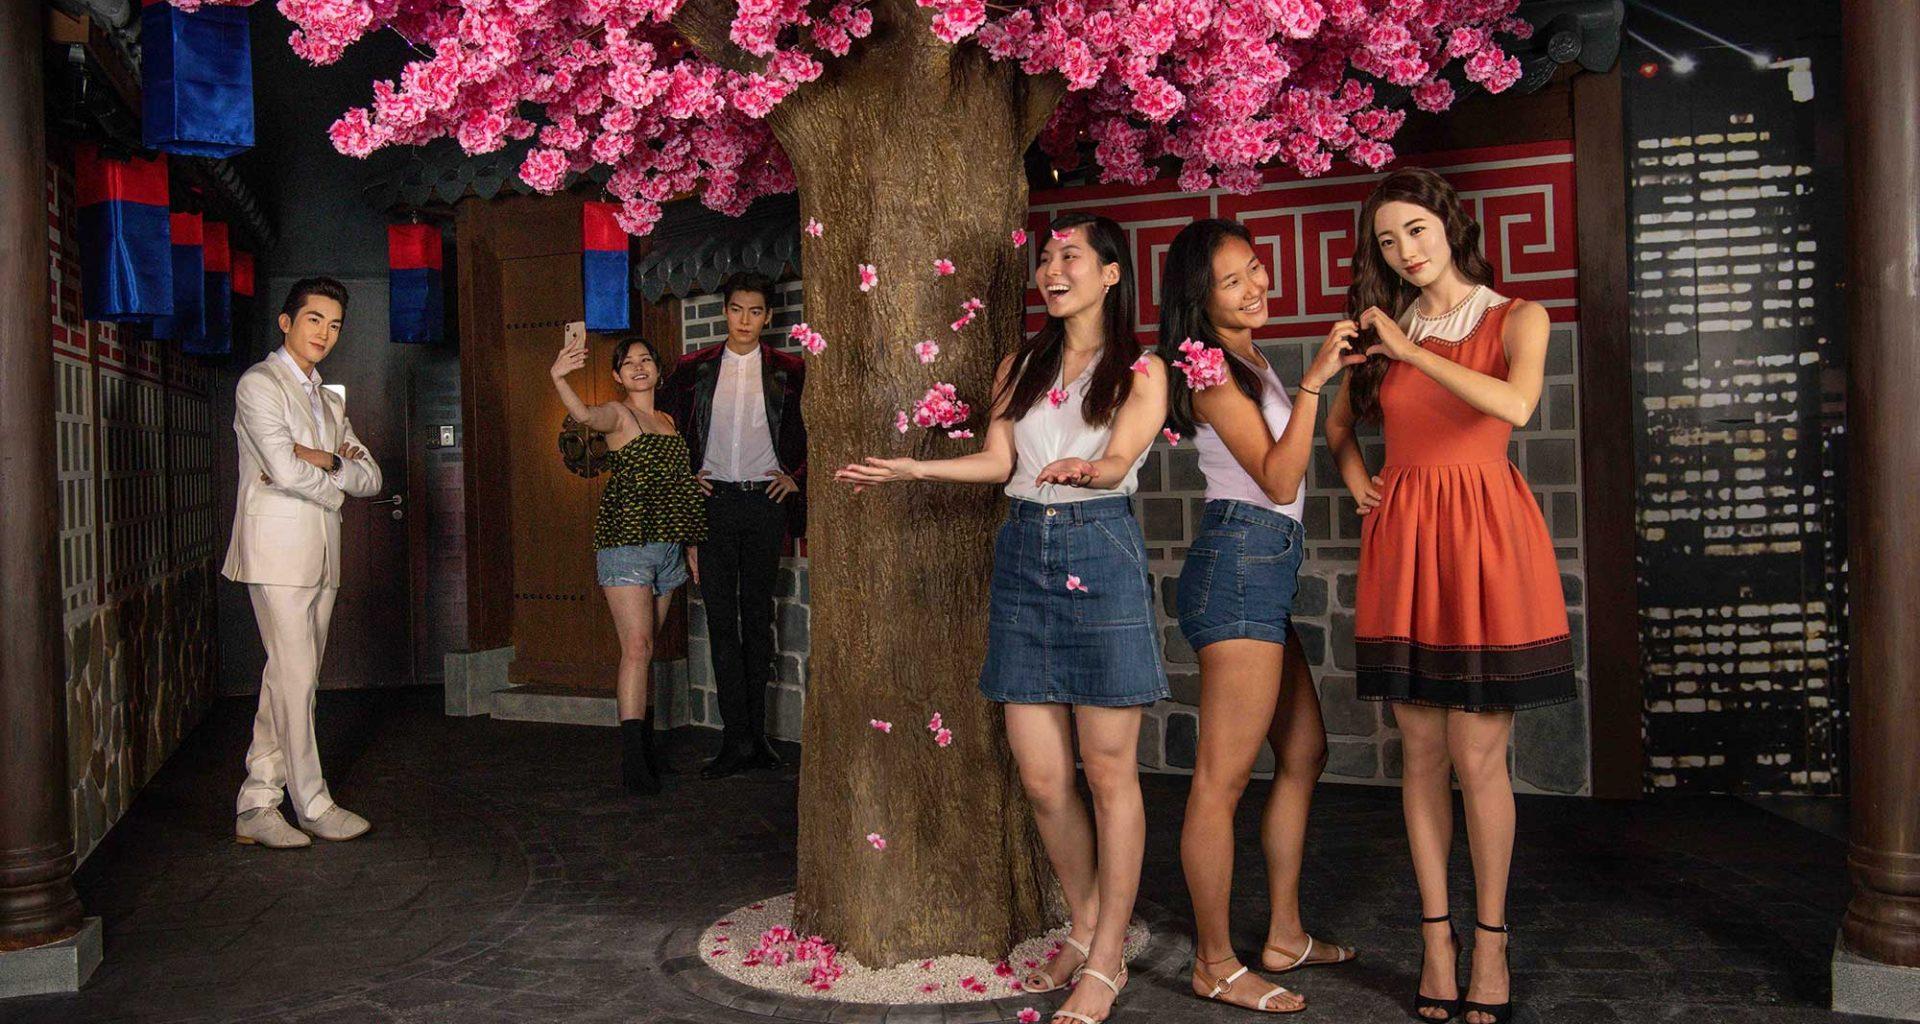 [SingapoRediscovers] K-wave Zone at Madame Tussauds Singapore - Alvinology